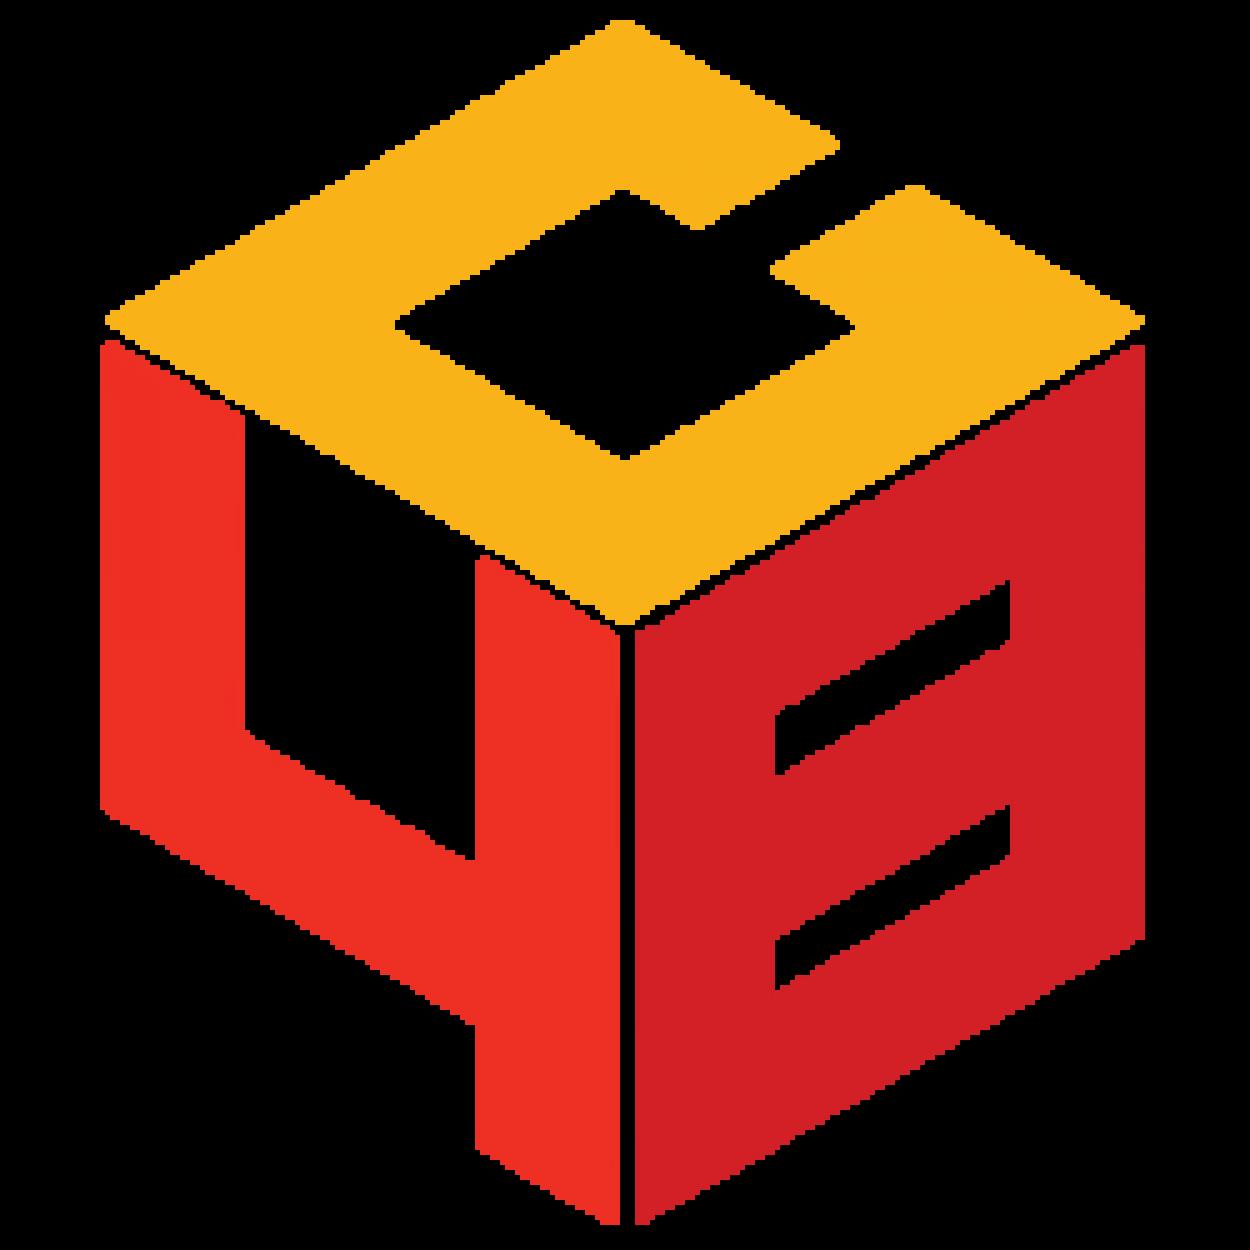 cube48logo